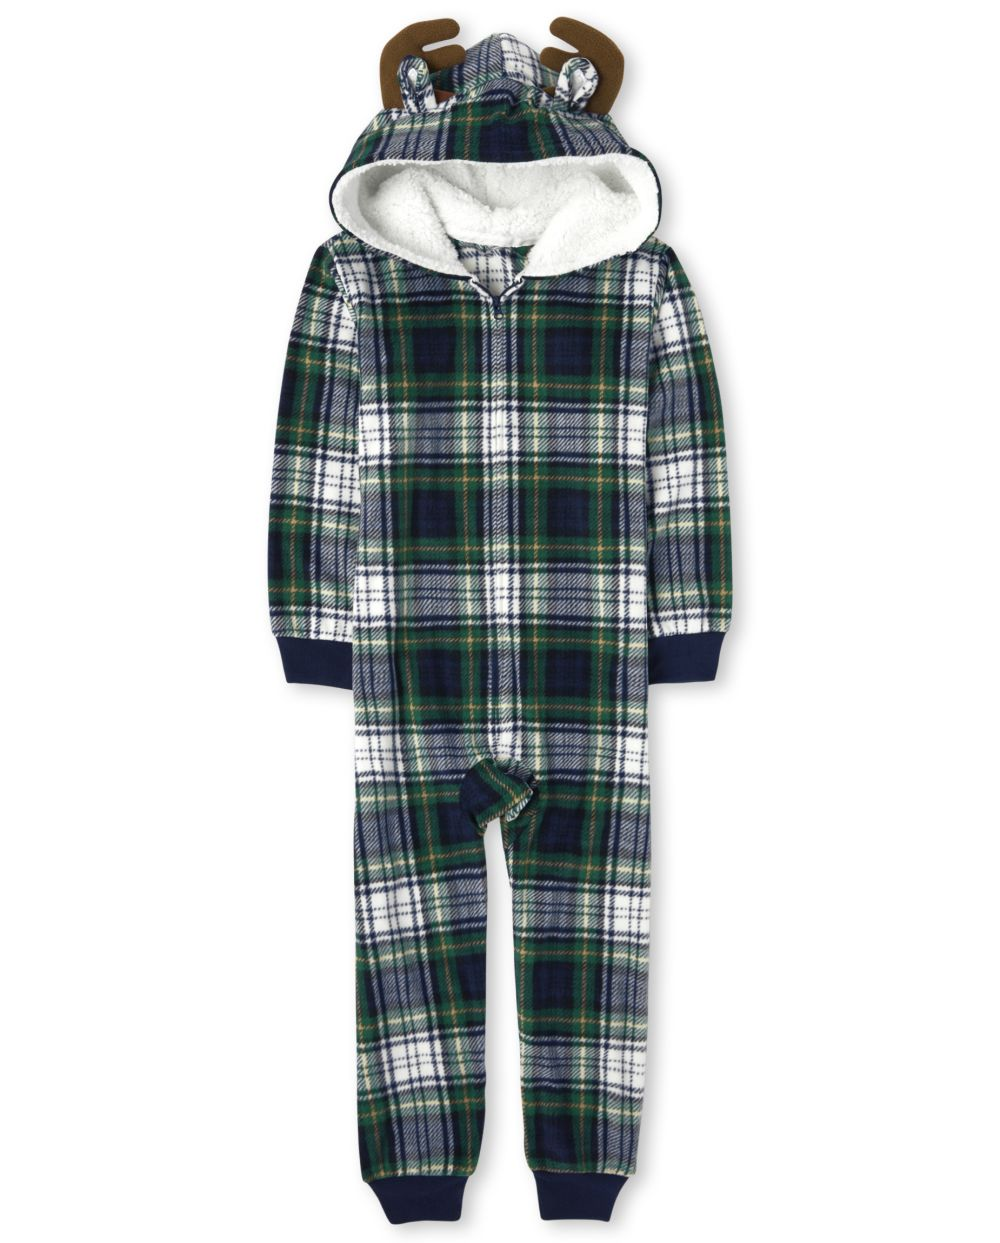 Unisex Kids Matching Family Moose Plaid Fleece One Piece Pajamas - Green